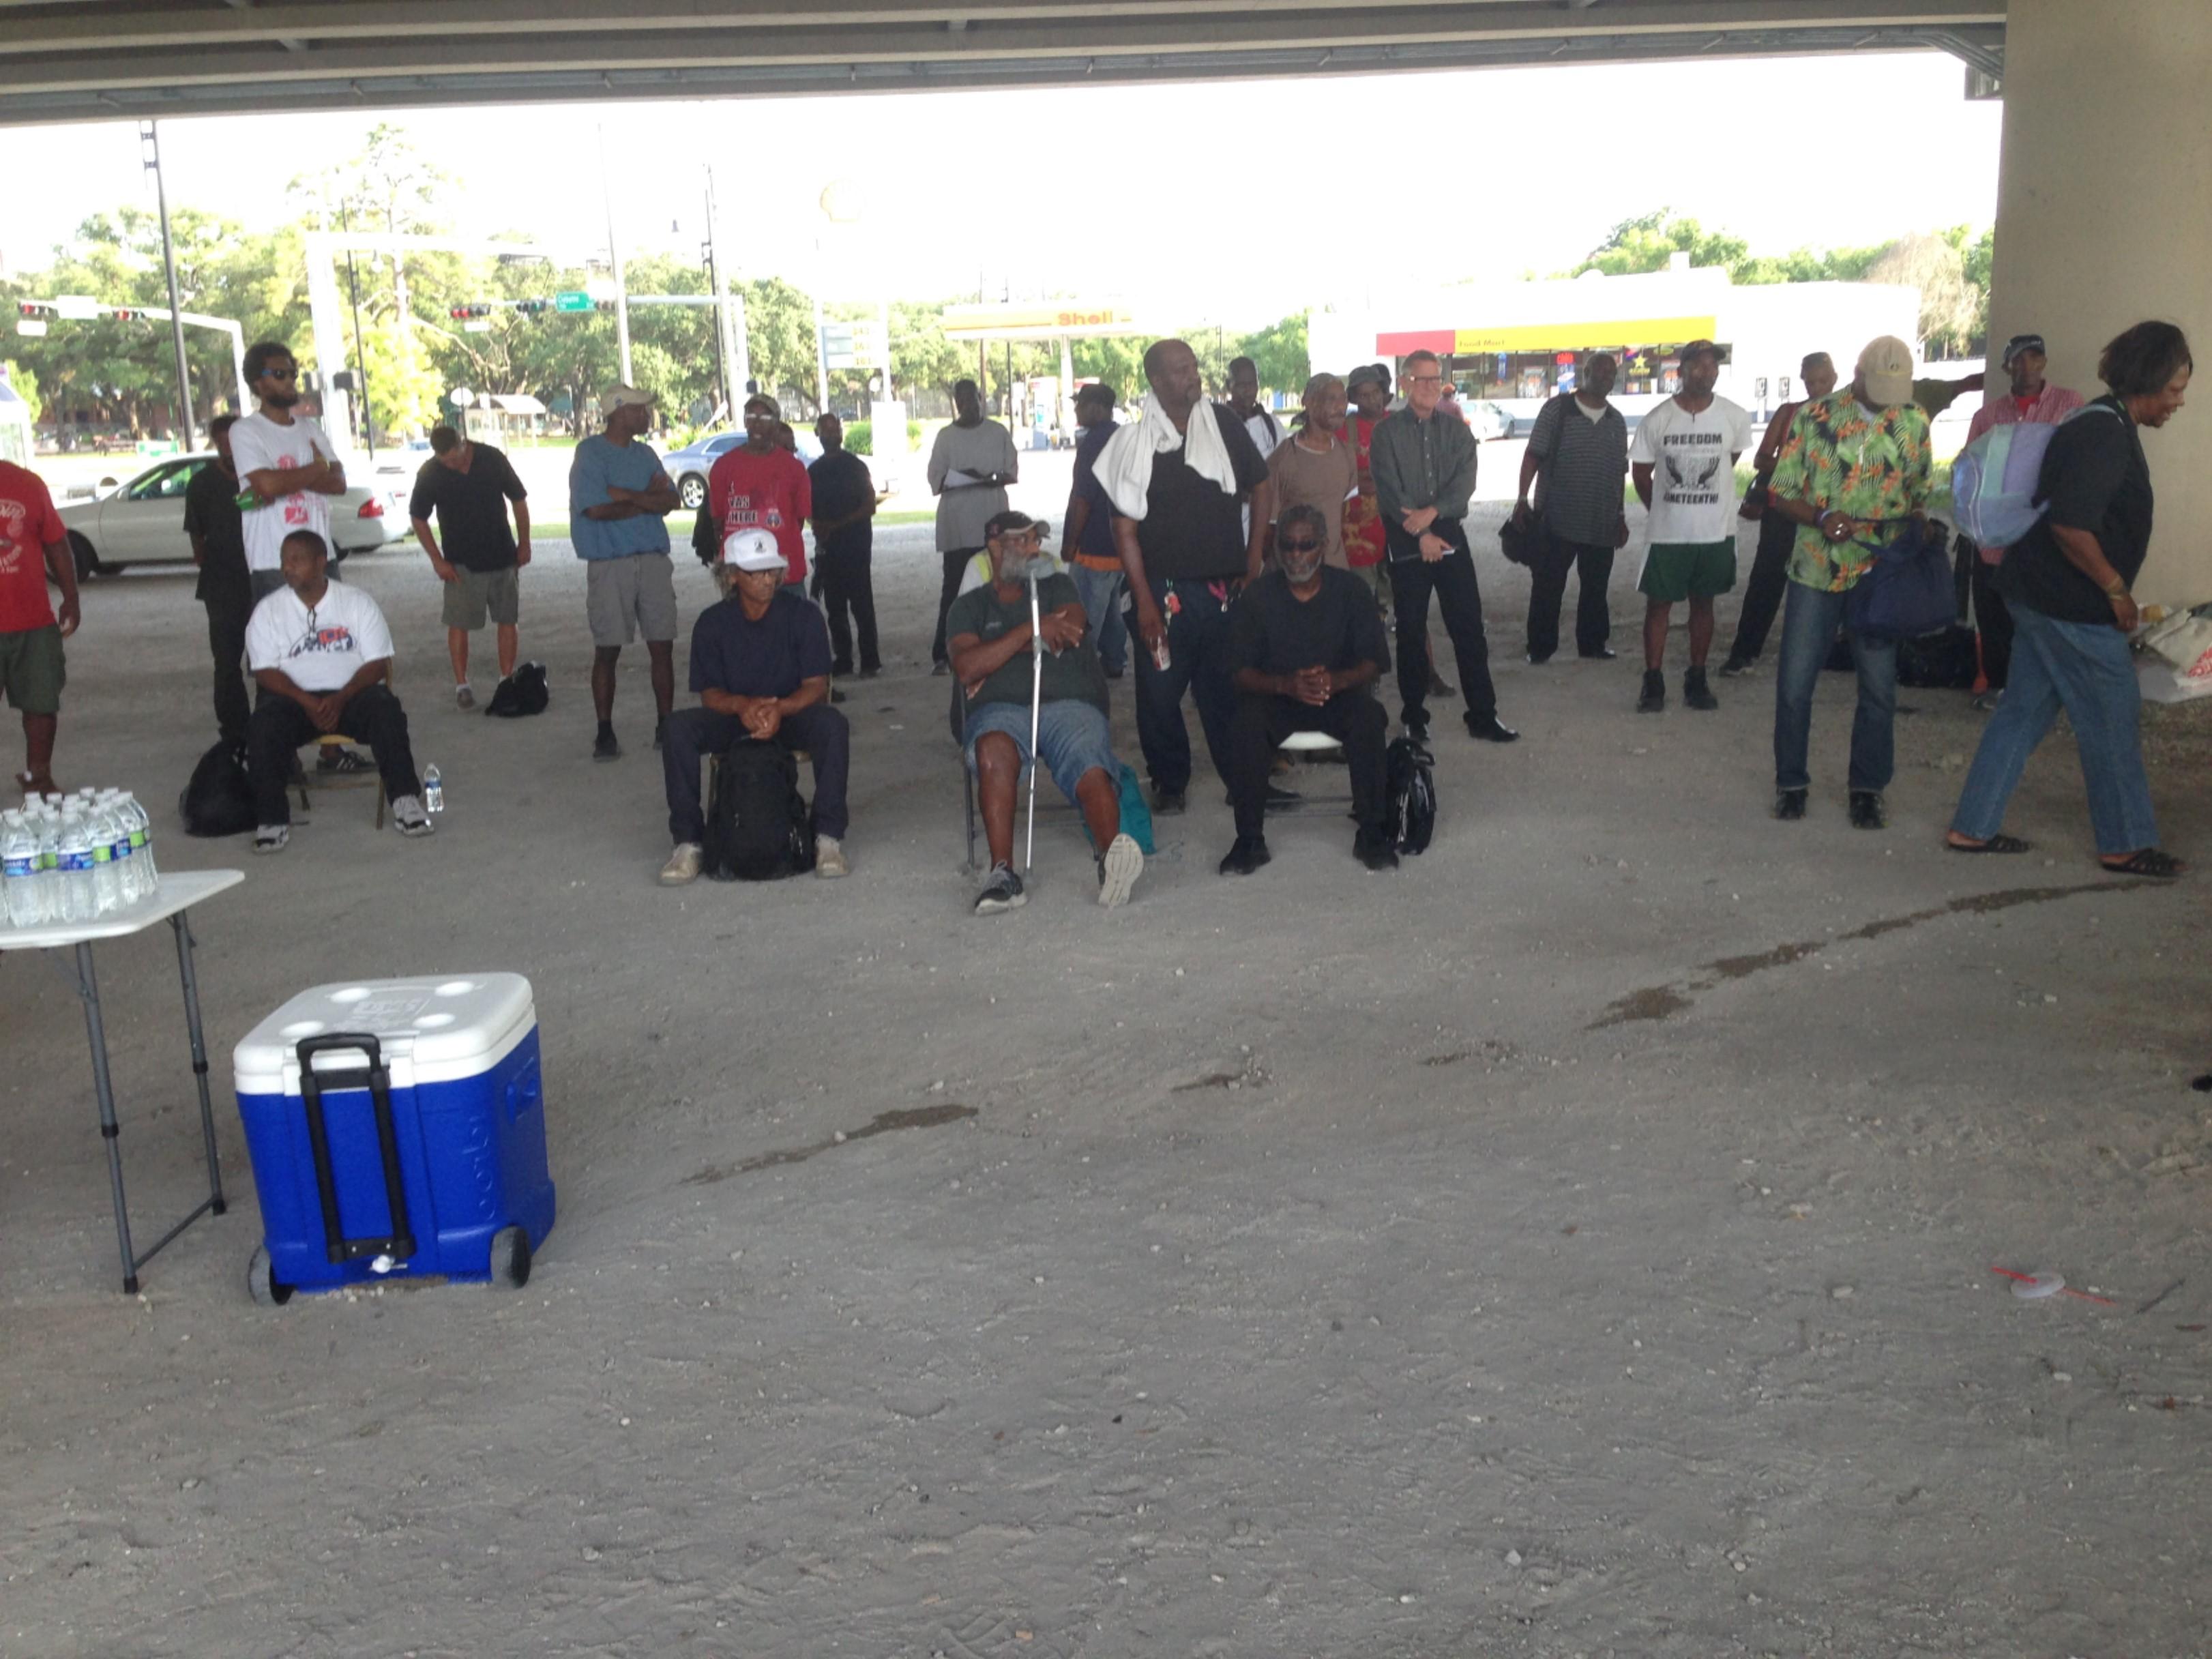 FBPM Under The Bridge July 31 2014